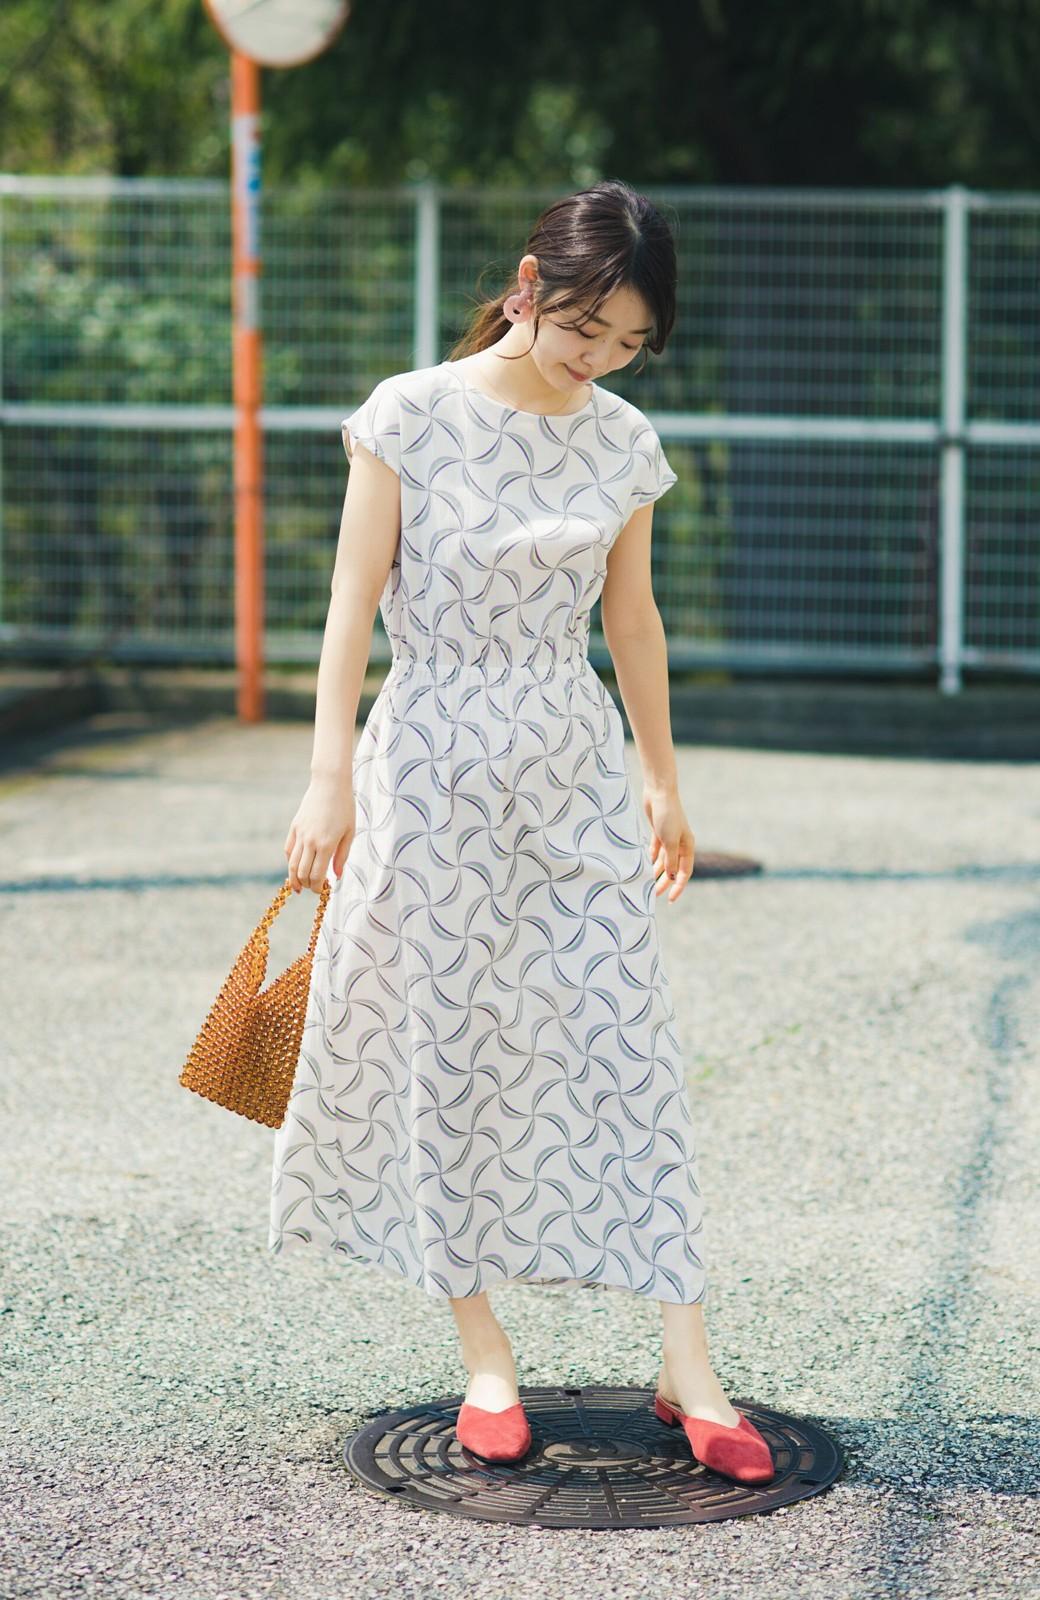 haco! 京都の浴衣屋さんと作った浴衣生地のウエストマークワンピース <ホワイト系その他>の商品写真3